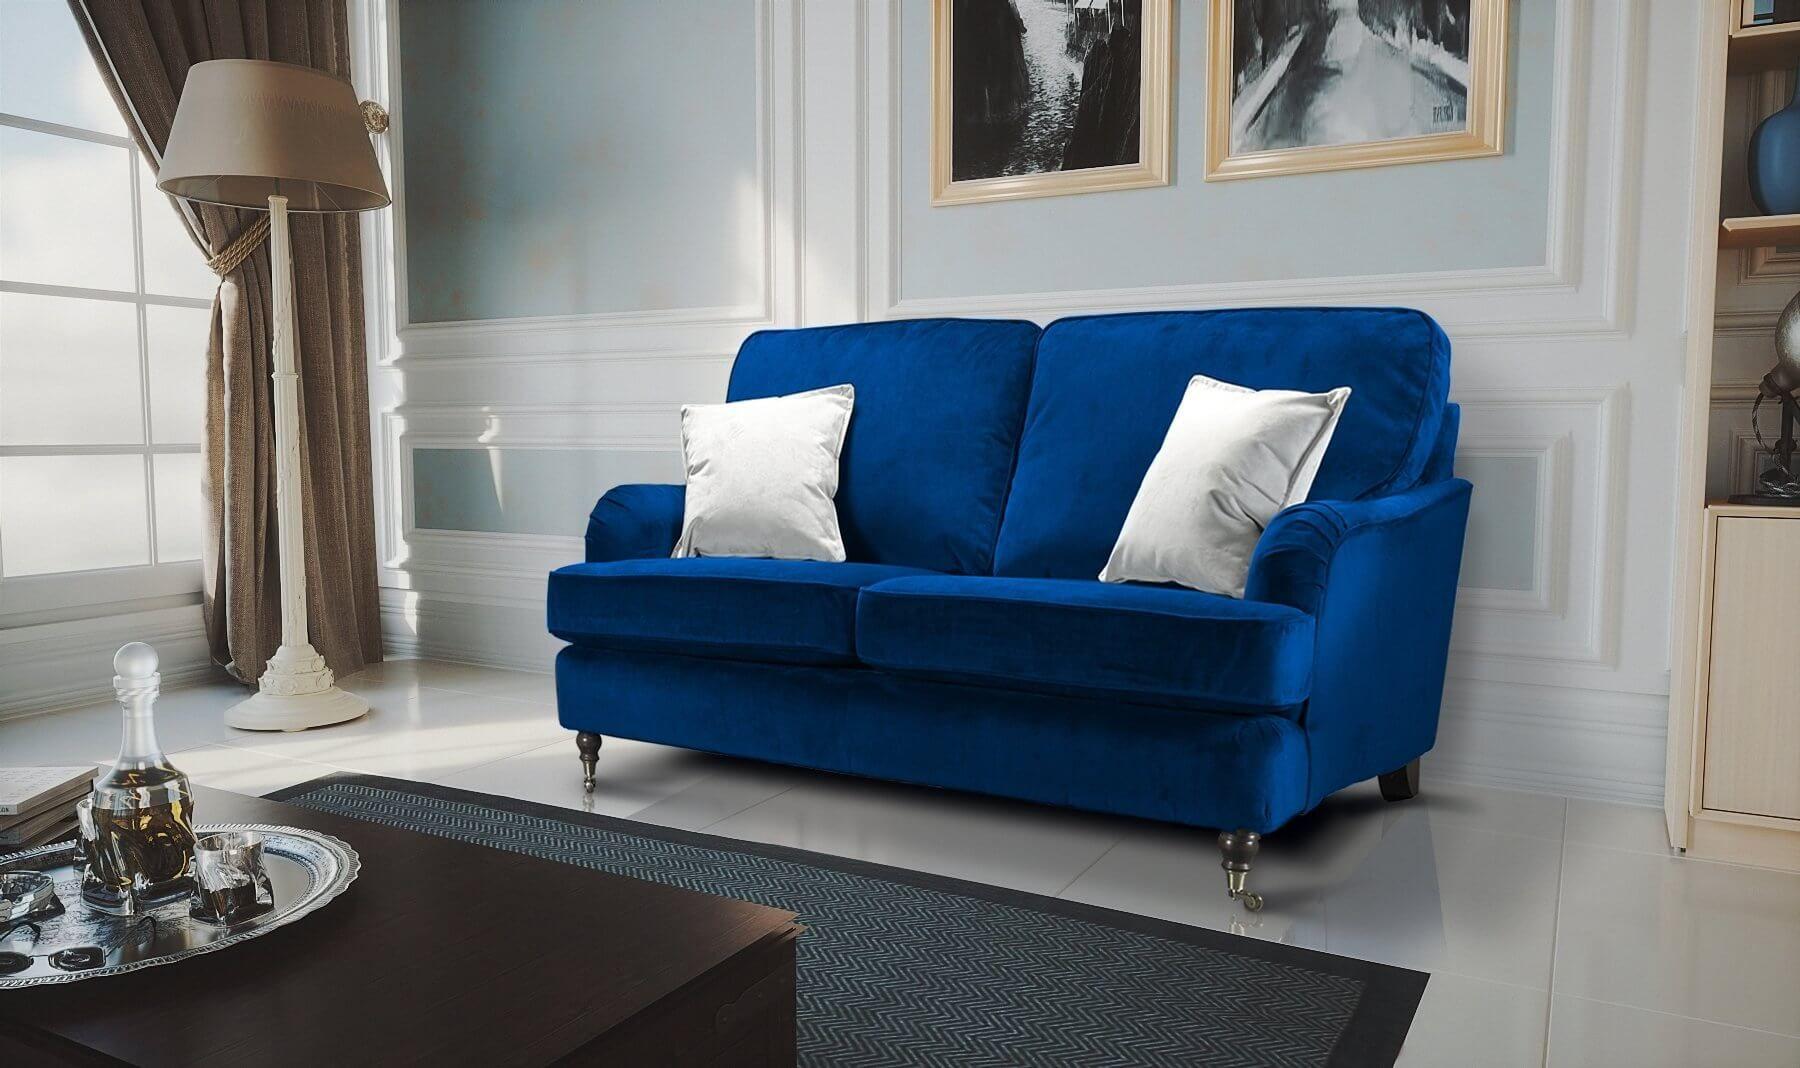 Velvet Marine Blue 2 Seater Astbury Bella Sofa In 2020 Sofa 3 Seater Sofa 3 Seater Sofa Bed